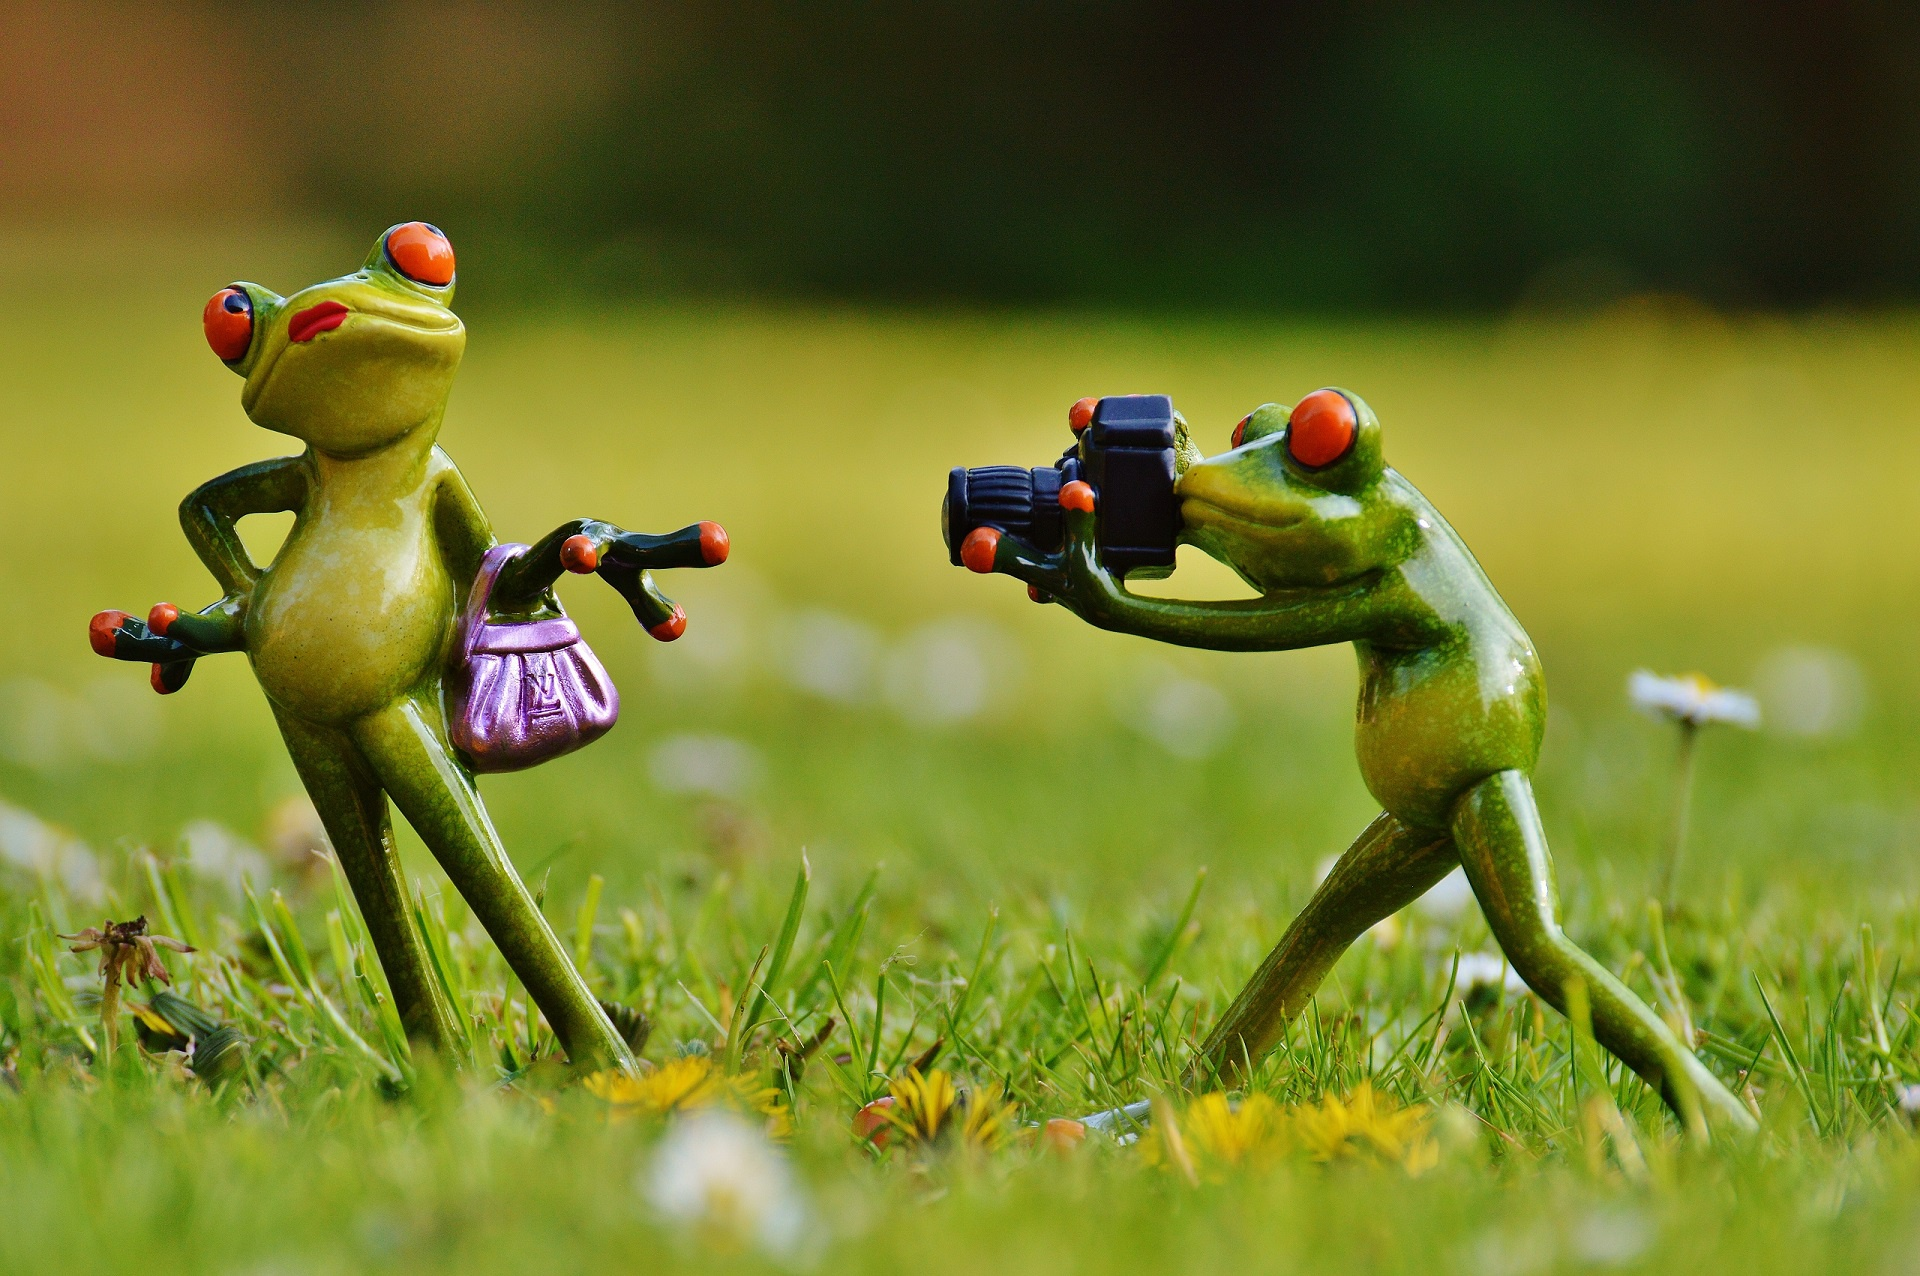 Картинки для, картинка лягушка путешественница смешная